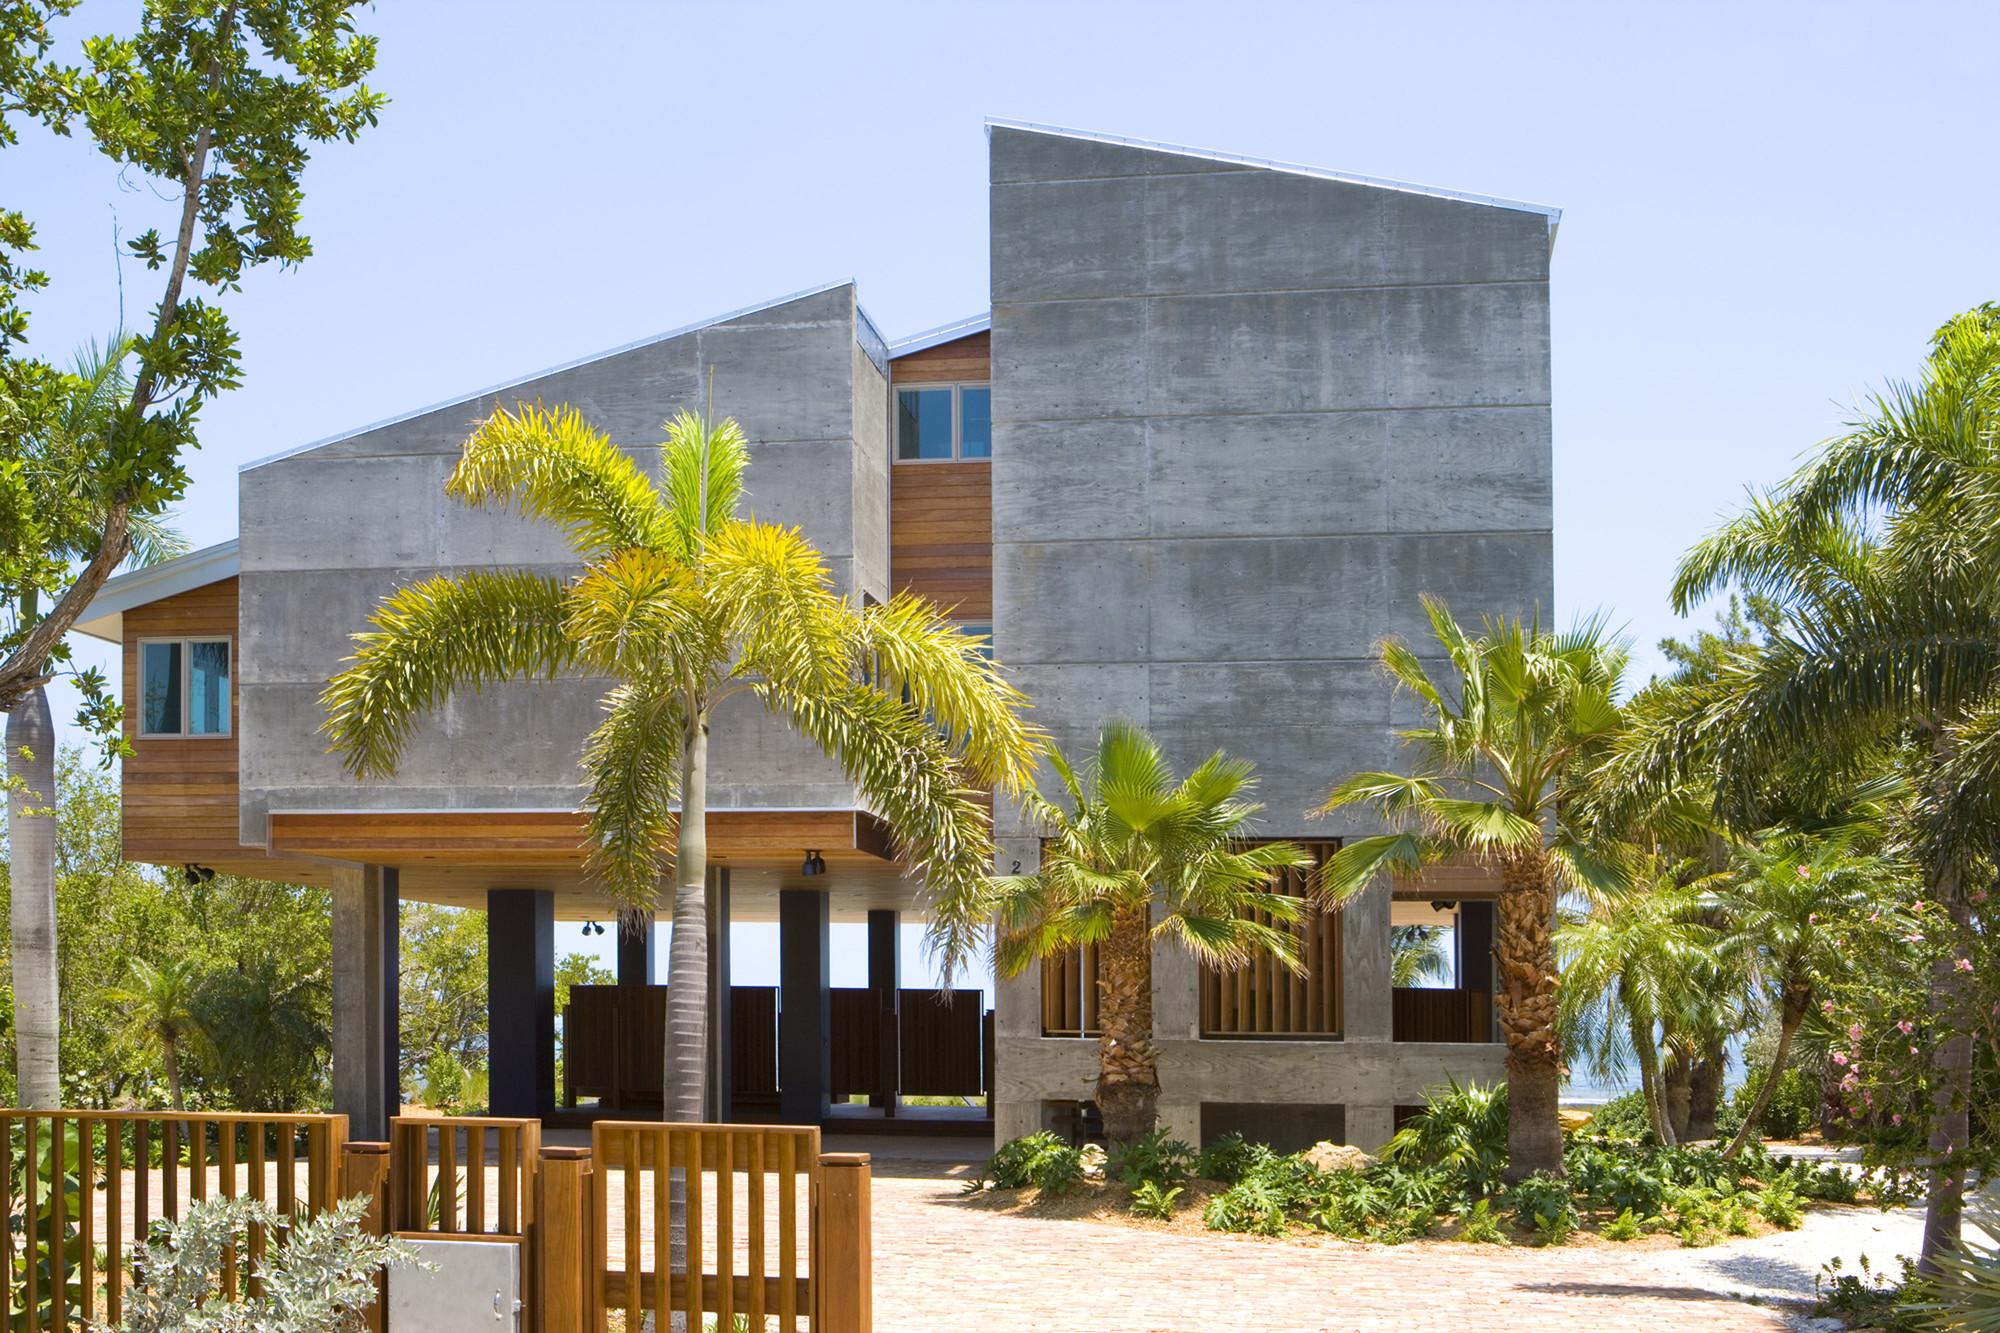 Tavernier Drive Residence / Luis Pons Design Lab, © Stephan Goettlicher